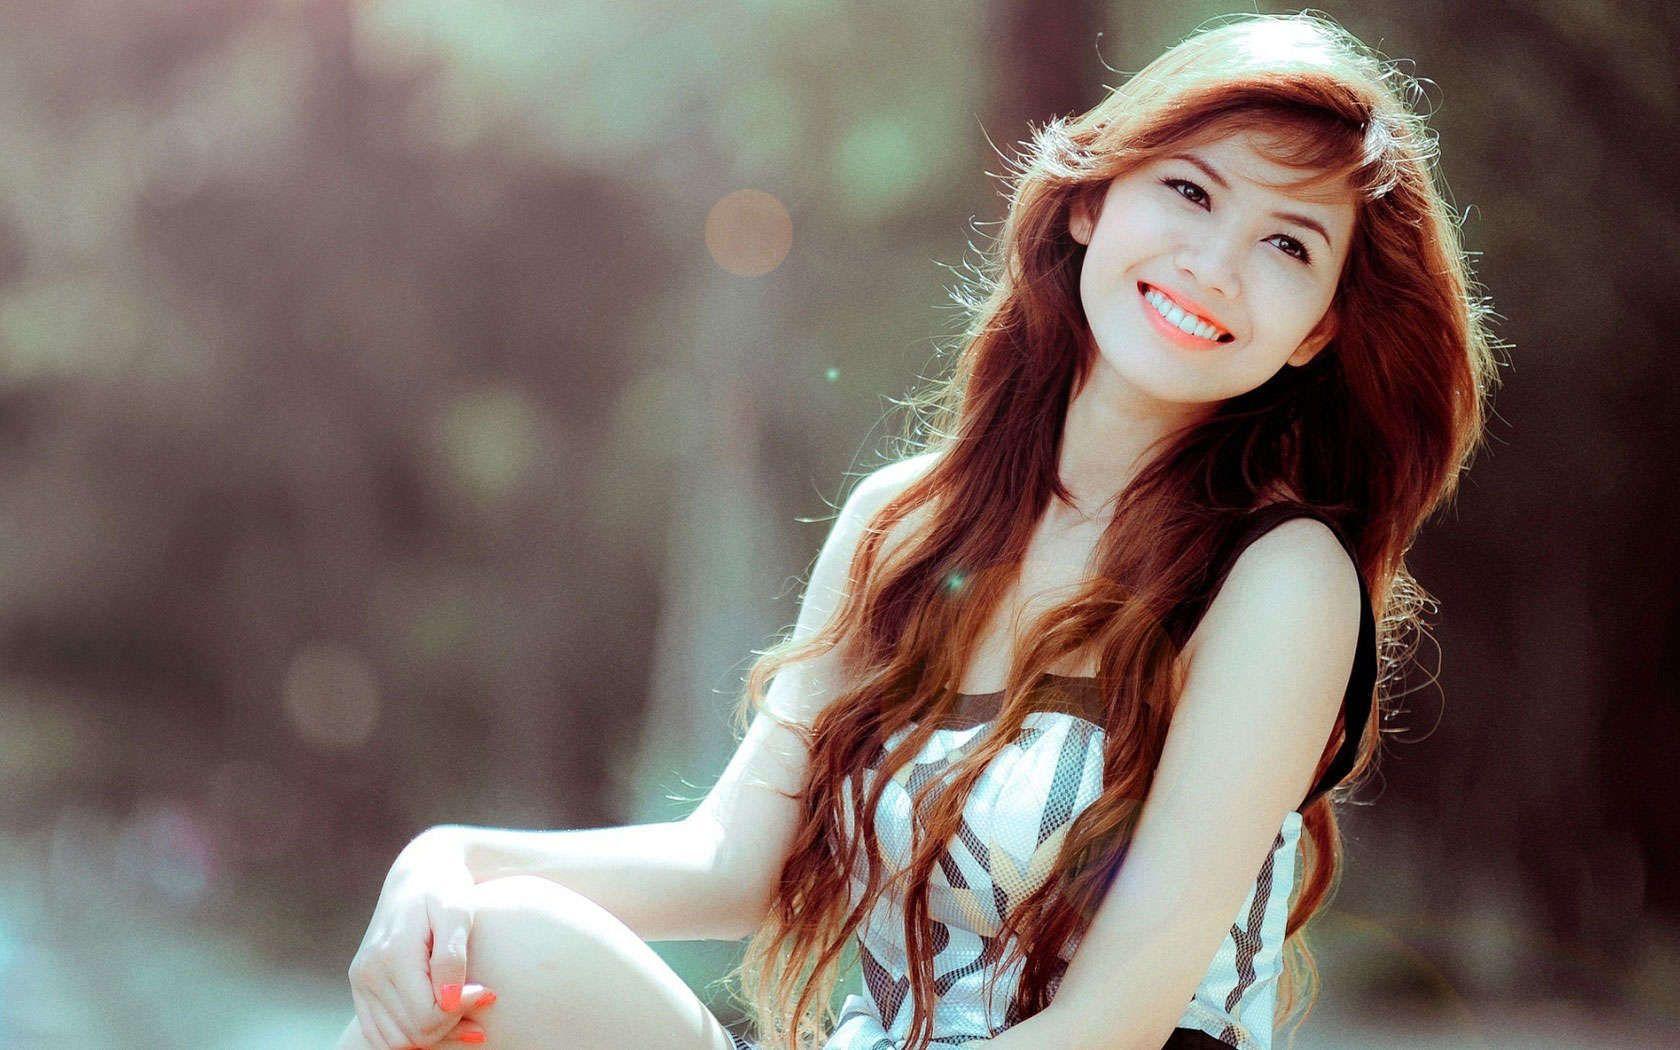 Https Www Linkedin Com Pulse Keeper50 Fifty Shades Darker Full Hd Online Movie Free Khasya Bharny Beautiful Girl Wallpaper Cute Girl Wallpaper Girl Wallpaper